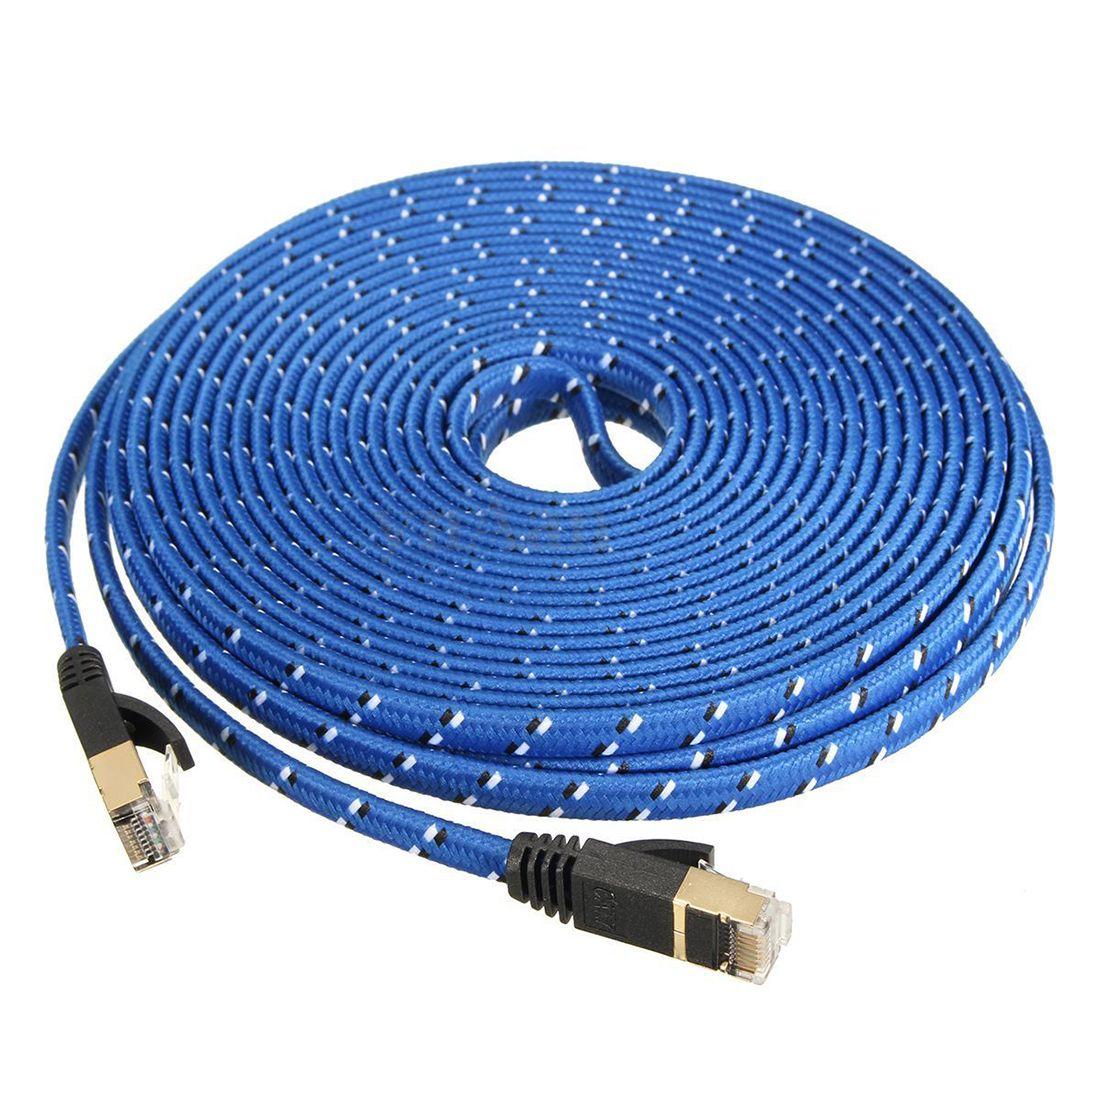 Top Angebote 10 Mt RJ45 CAT 7 CAT7 Ethernet Internet LAN Patch Netzwerk Flachkabel Kabel